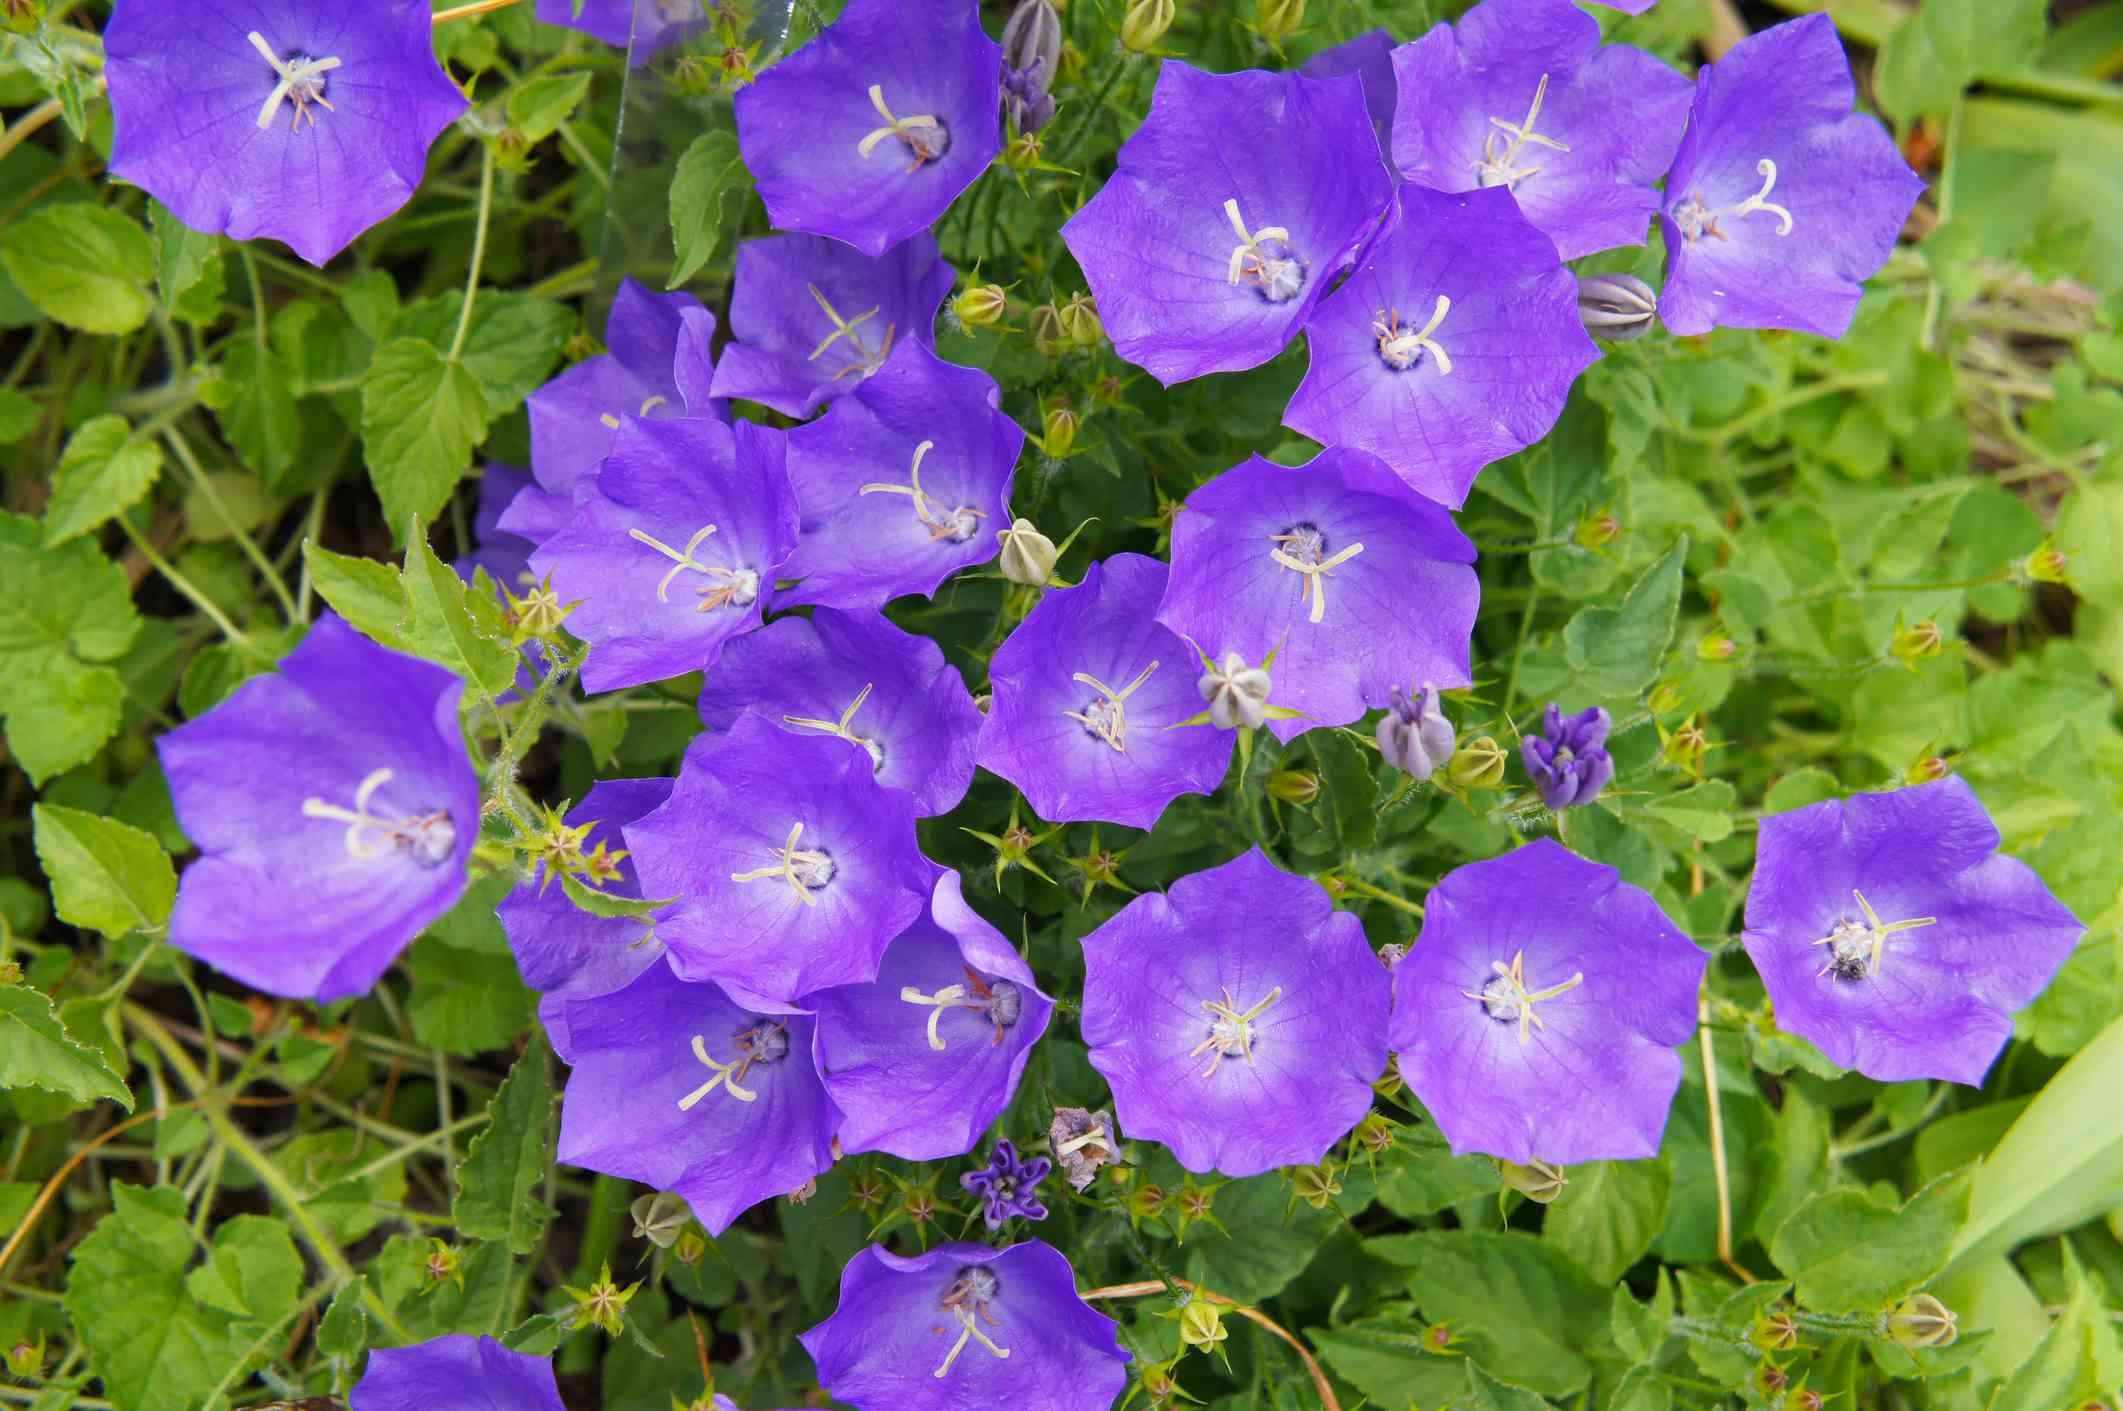 Several flowers of Carpathian bellflower.